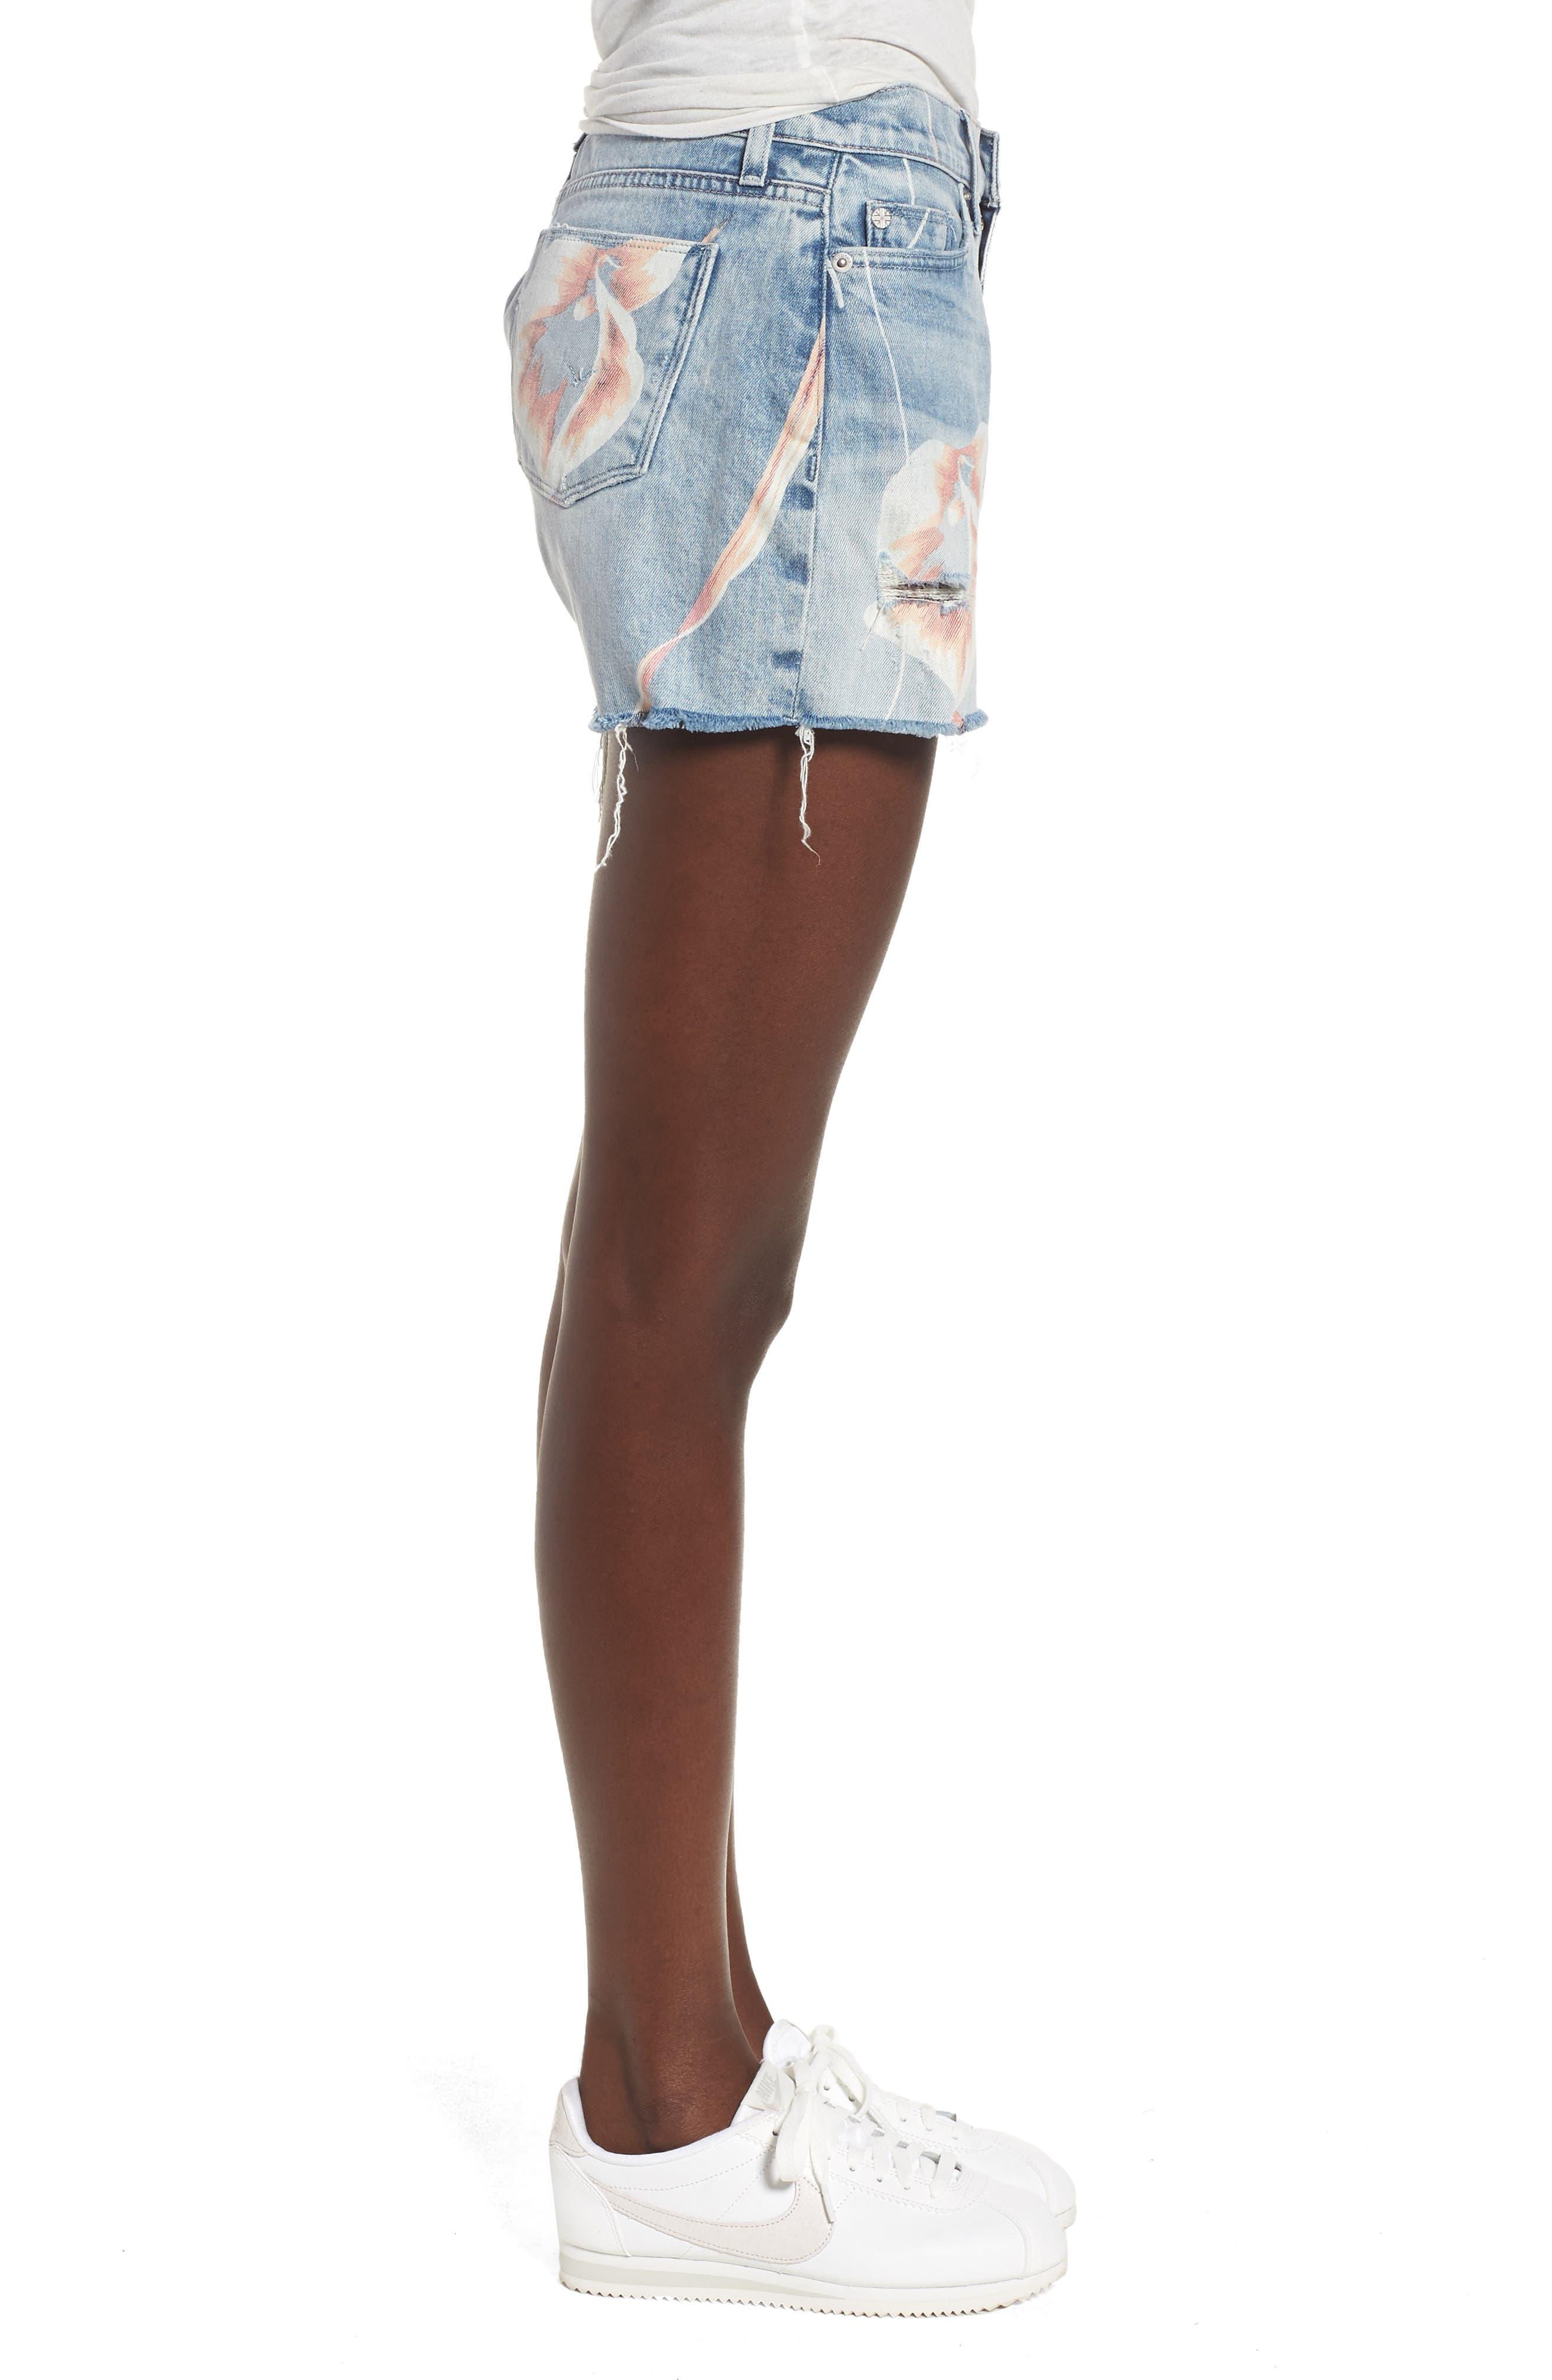 Valeri Painted Denim Shorts,                             Alternate thumbnail 3, color,                             In Bloom